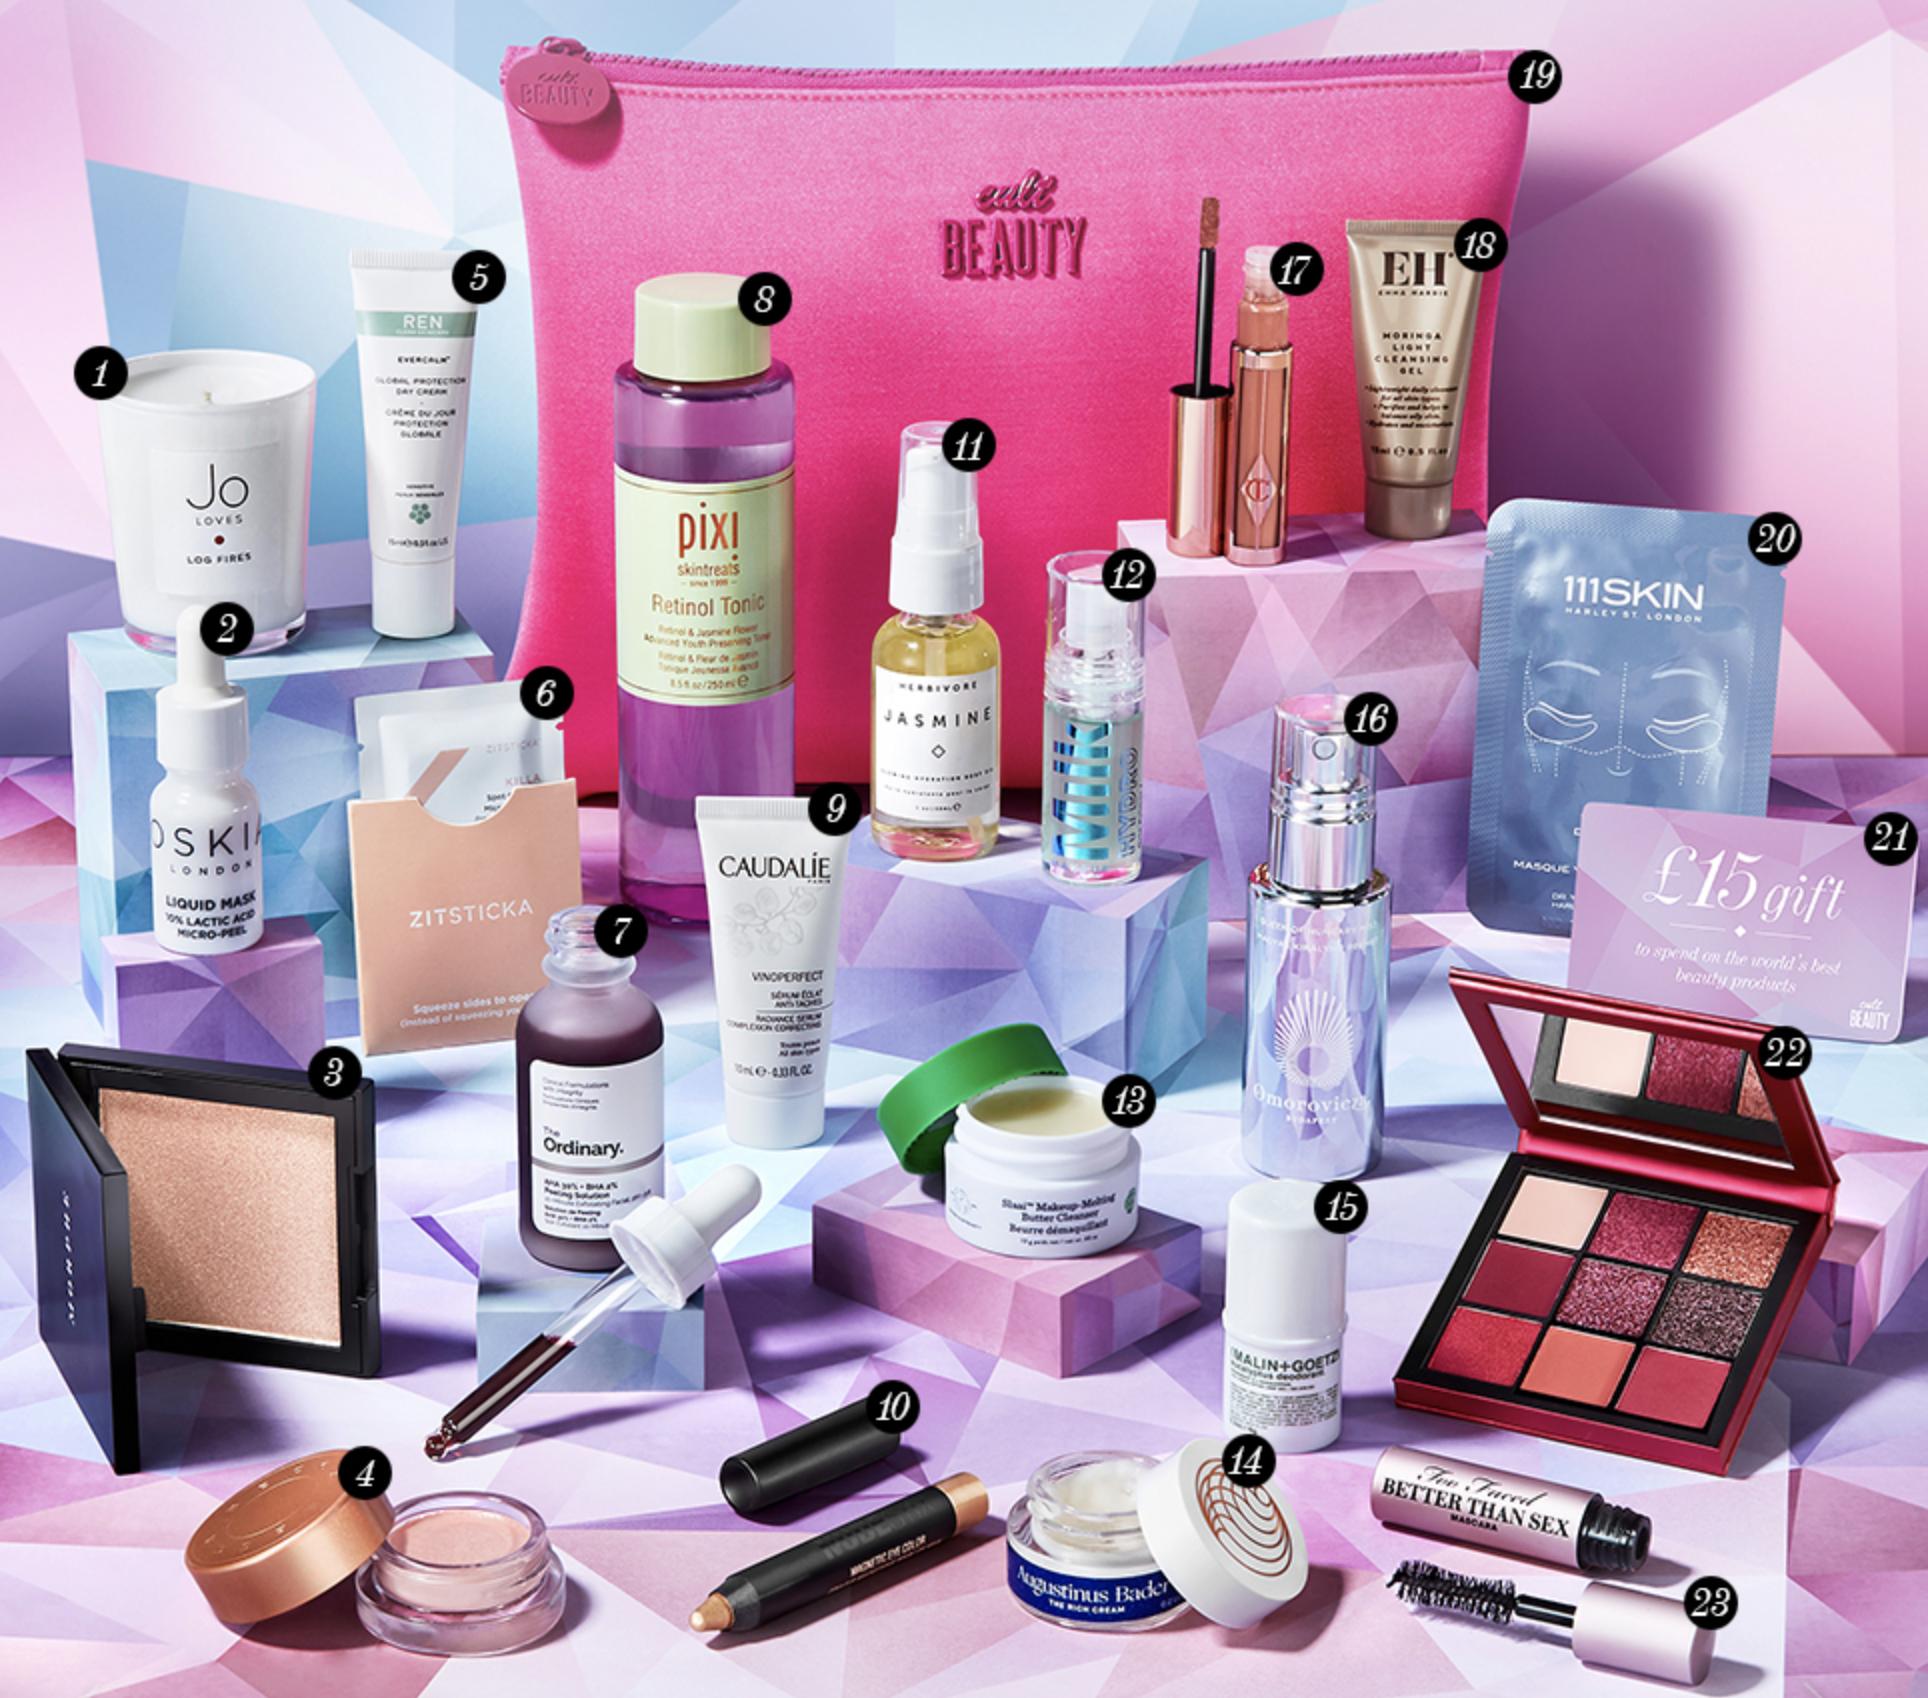 cult beauty goody bag 2019 g